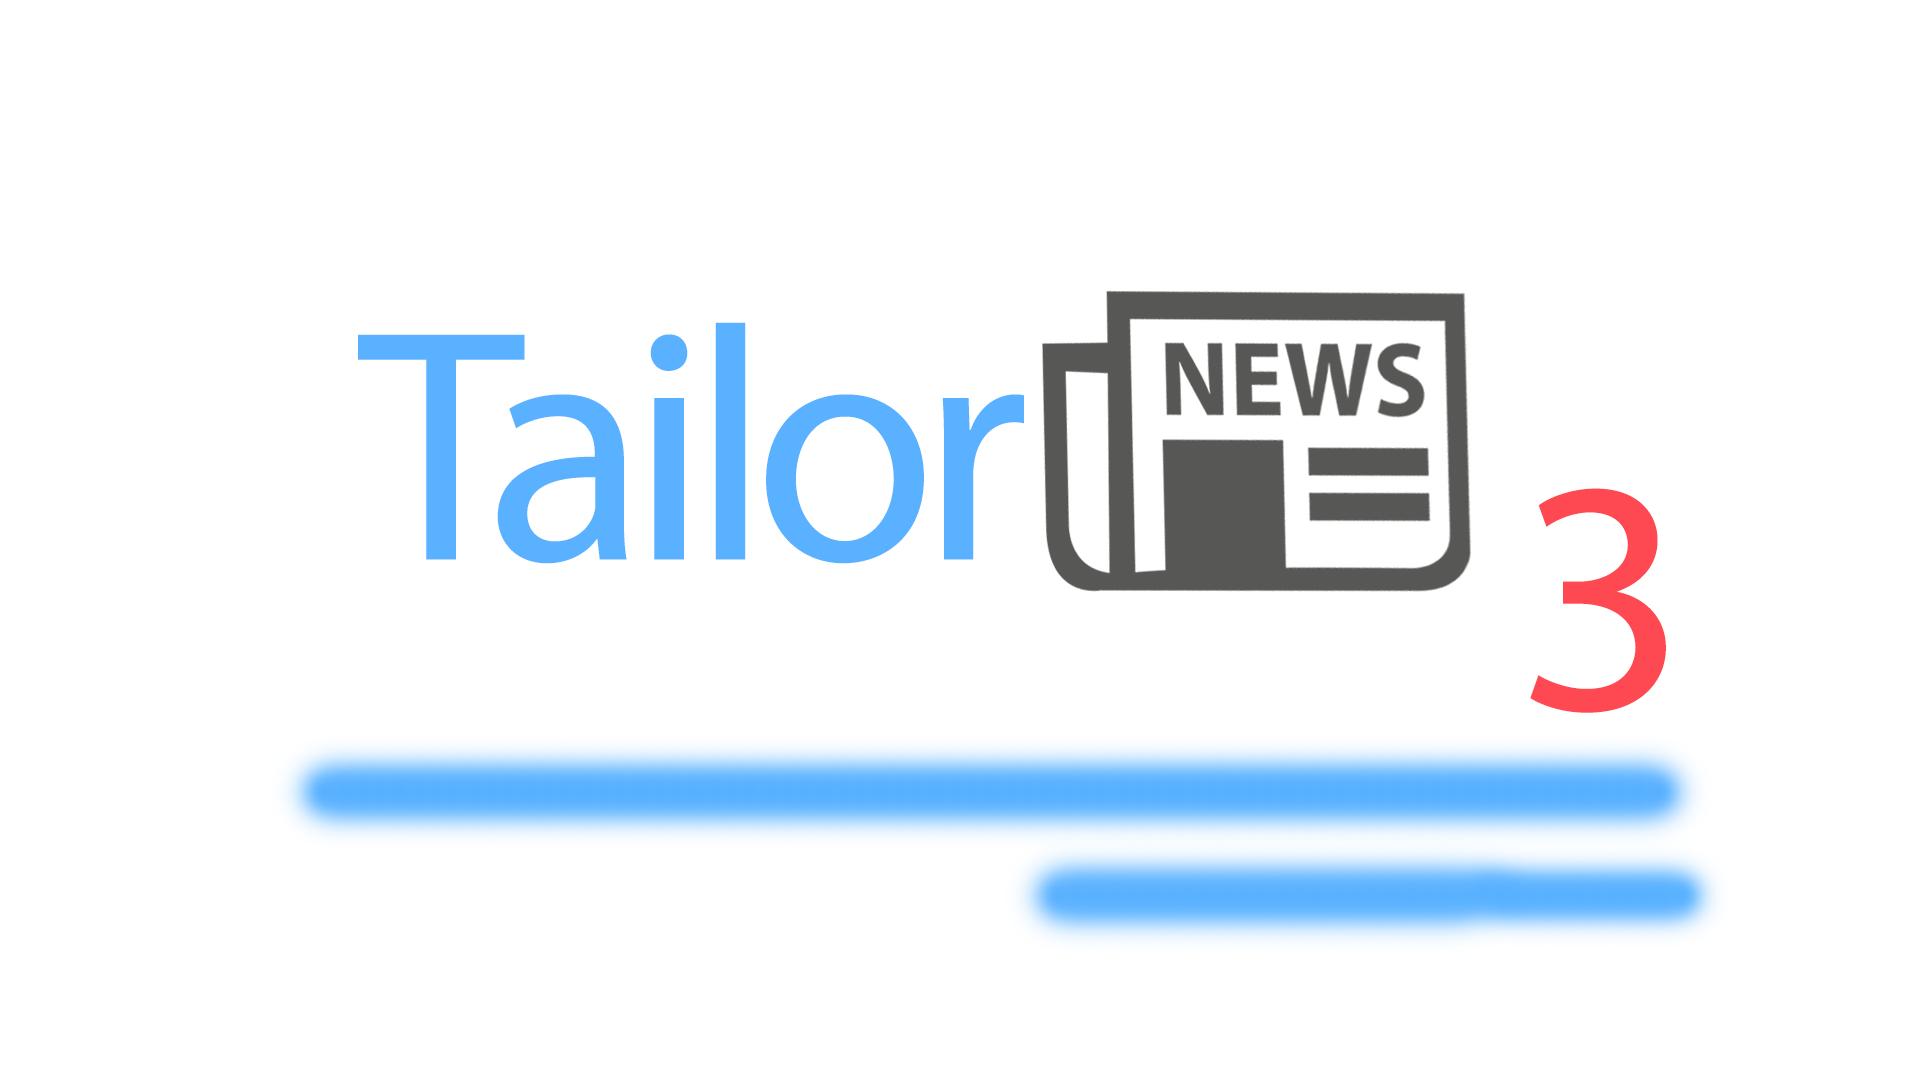 Blog Tailornews 3